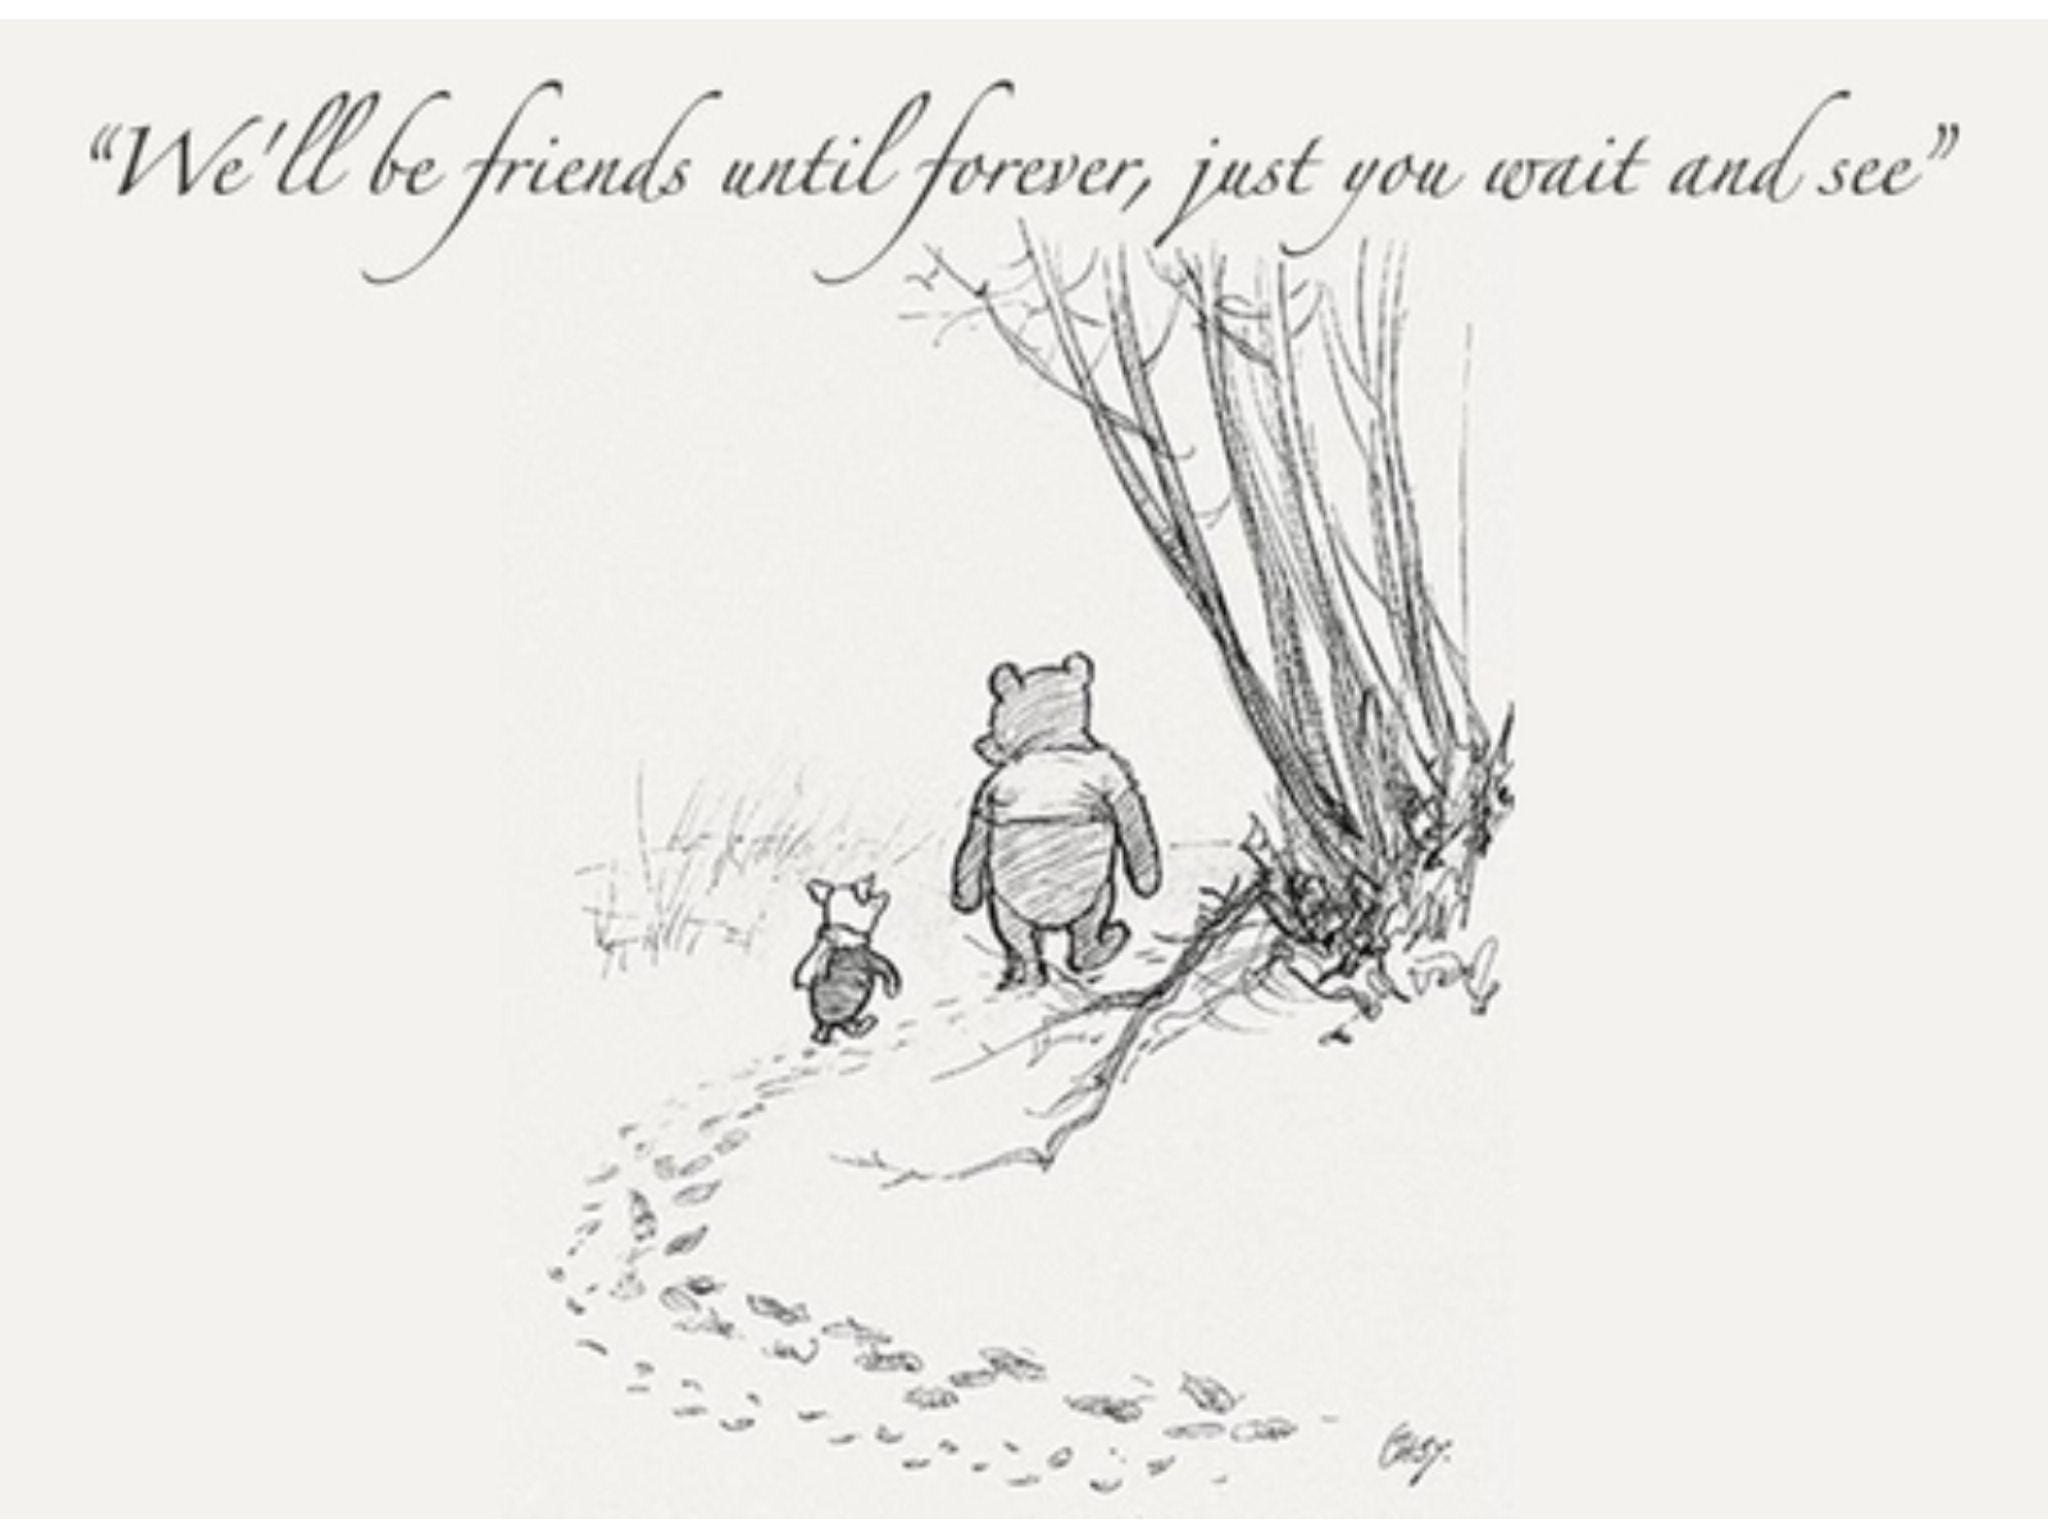 Friends forever.